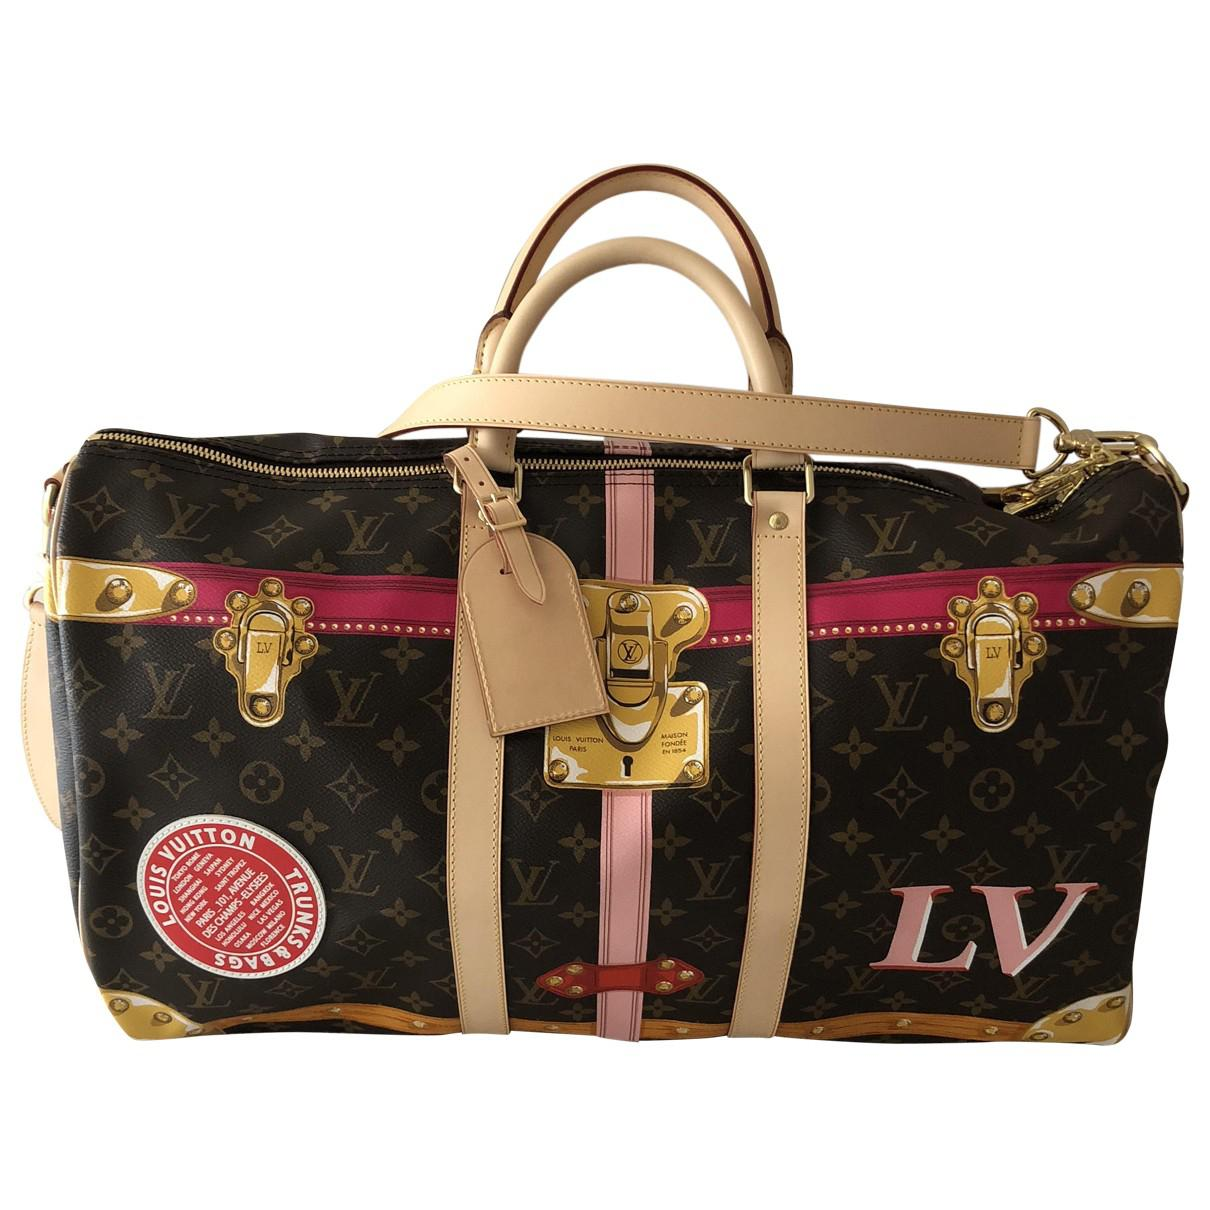 8686edc84d4a Louis Vuitton - Black Keepall Travel Bag - Lyst. View fullscreen